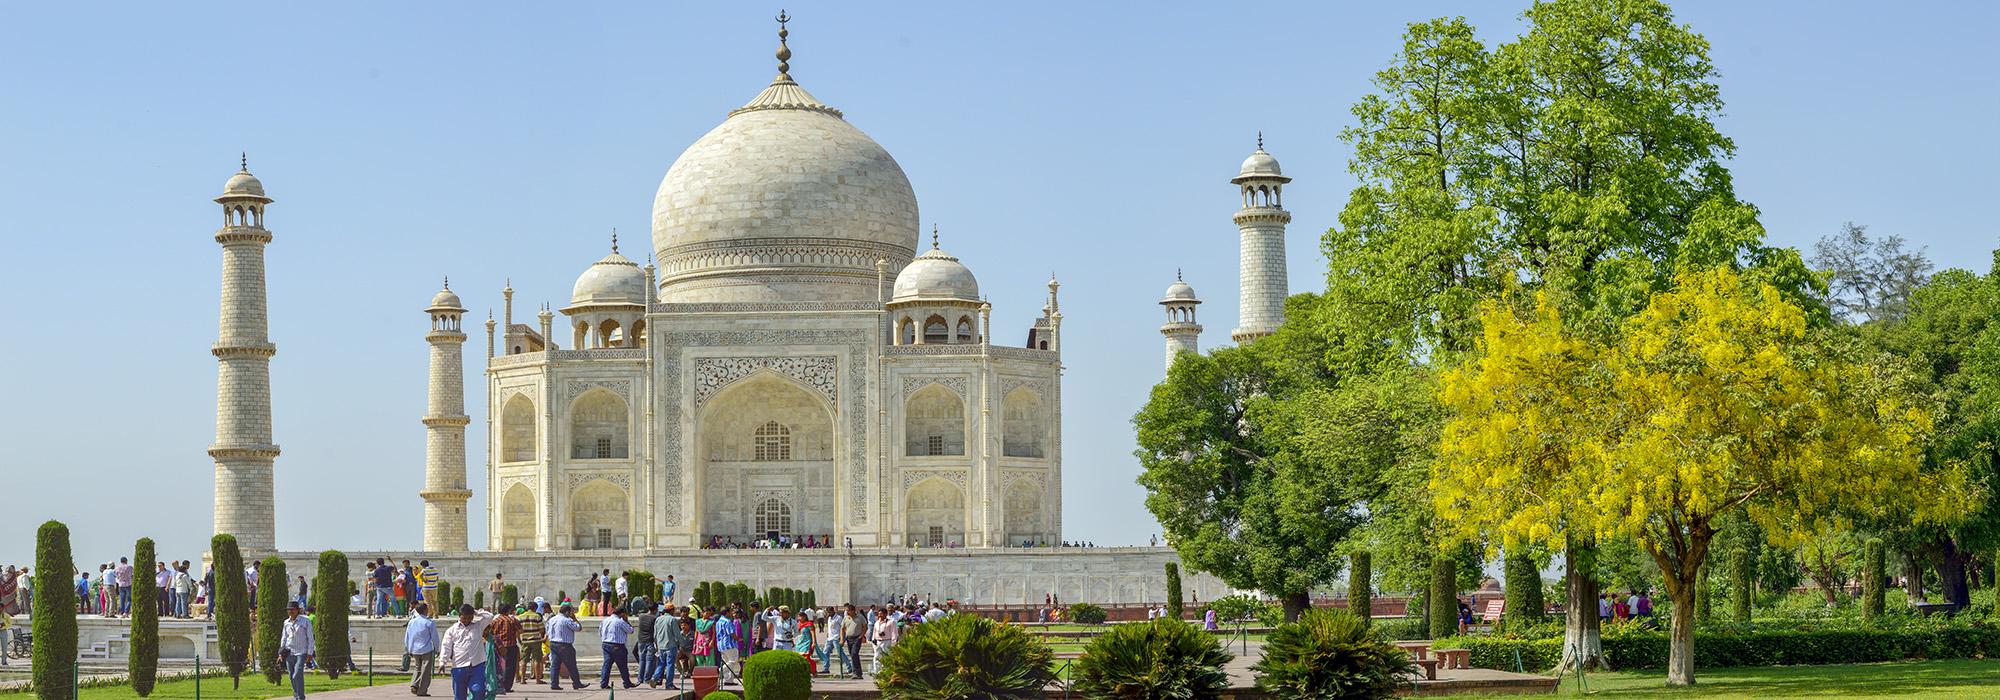 India_Agra_TajMahal_WikimediaCommons_2014_Hero.jpg